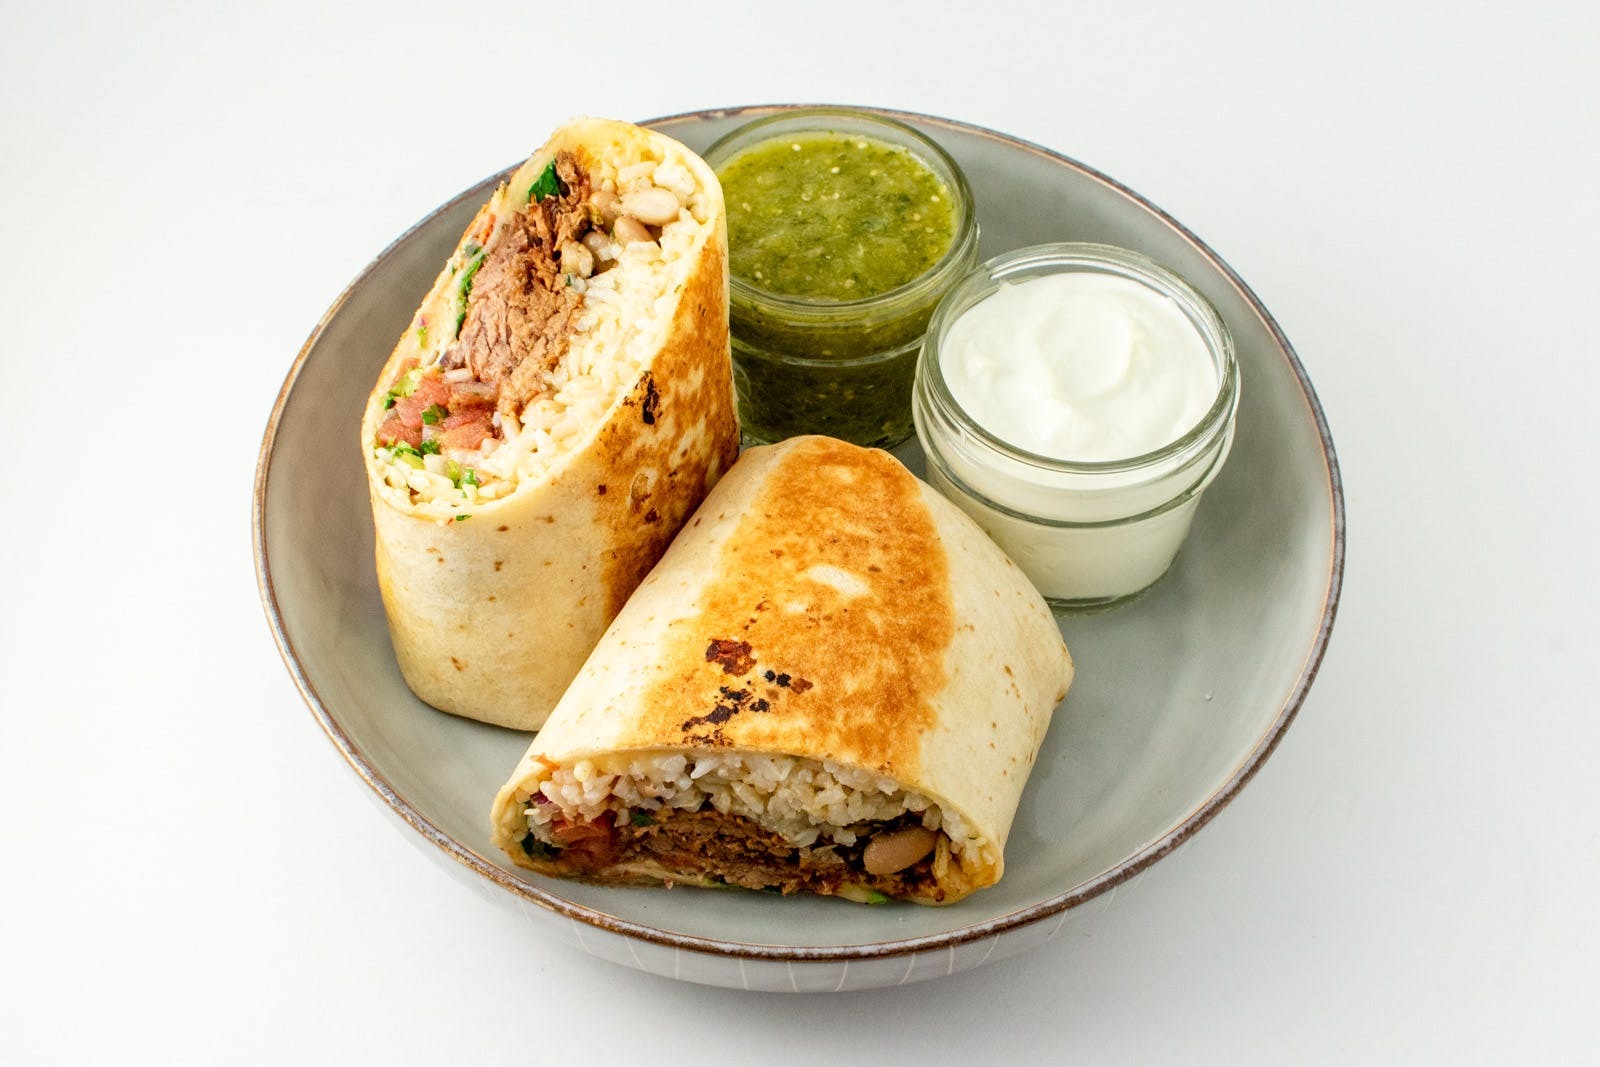 12 Hour Brisket Burrito from Taco Royale - Eastside Madison in Madison, WI